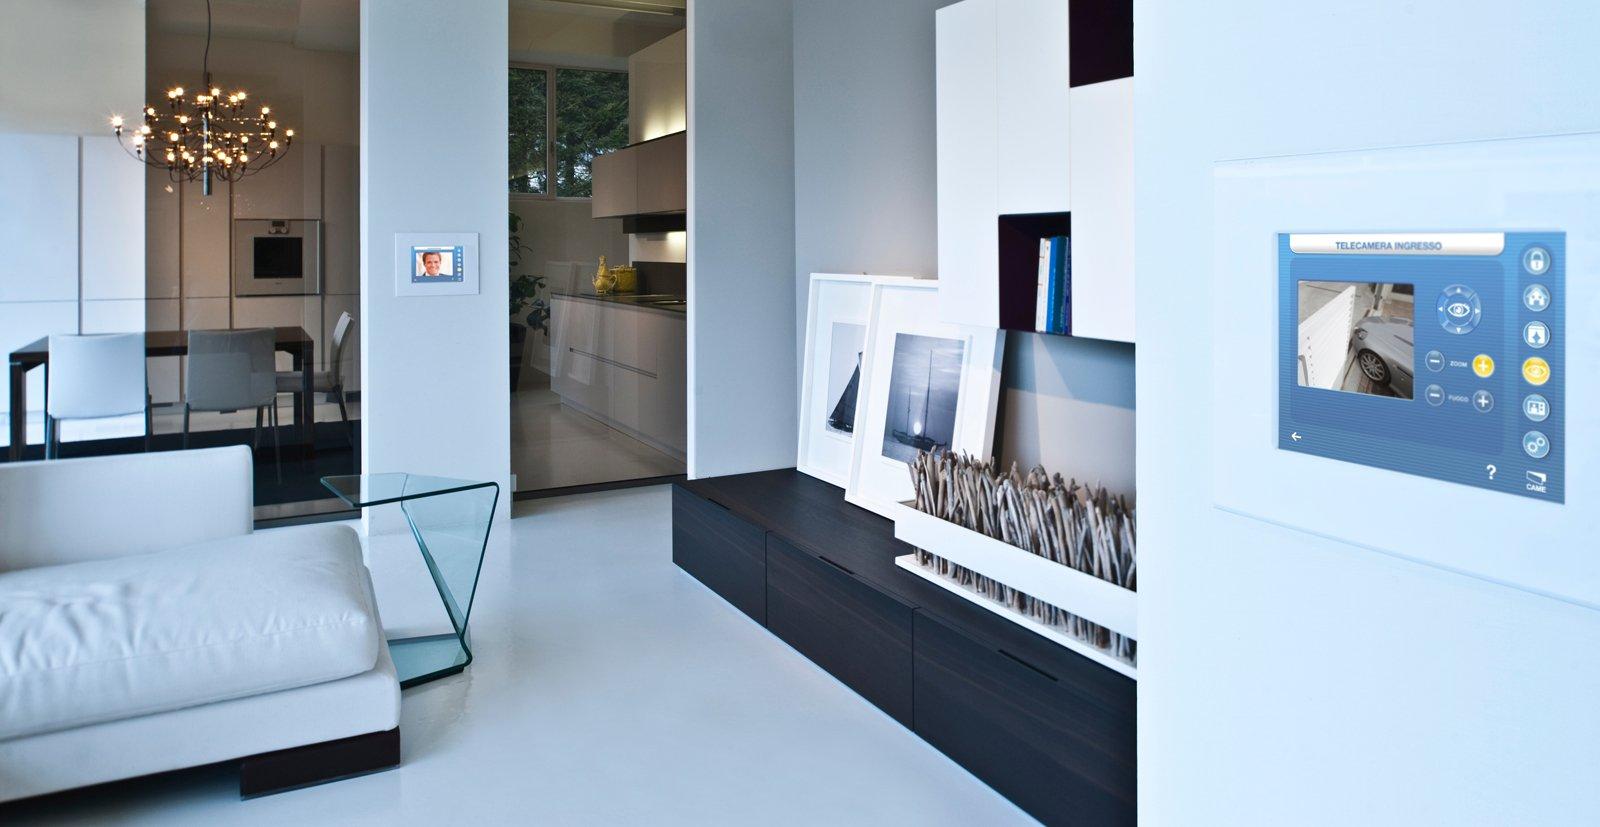 Casa telecomandata con la domotica cose di casa - Trasformare una casa in domotica ...